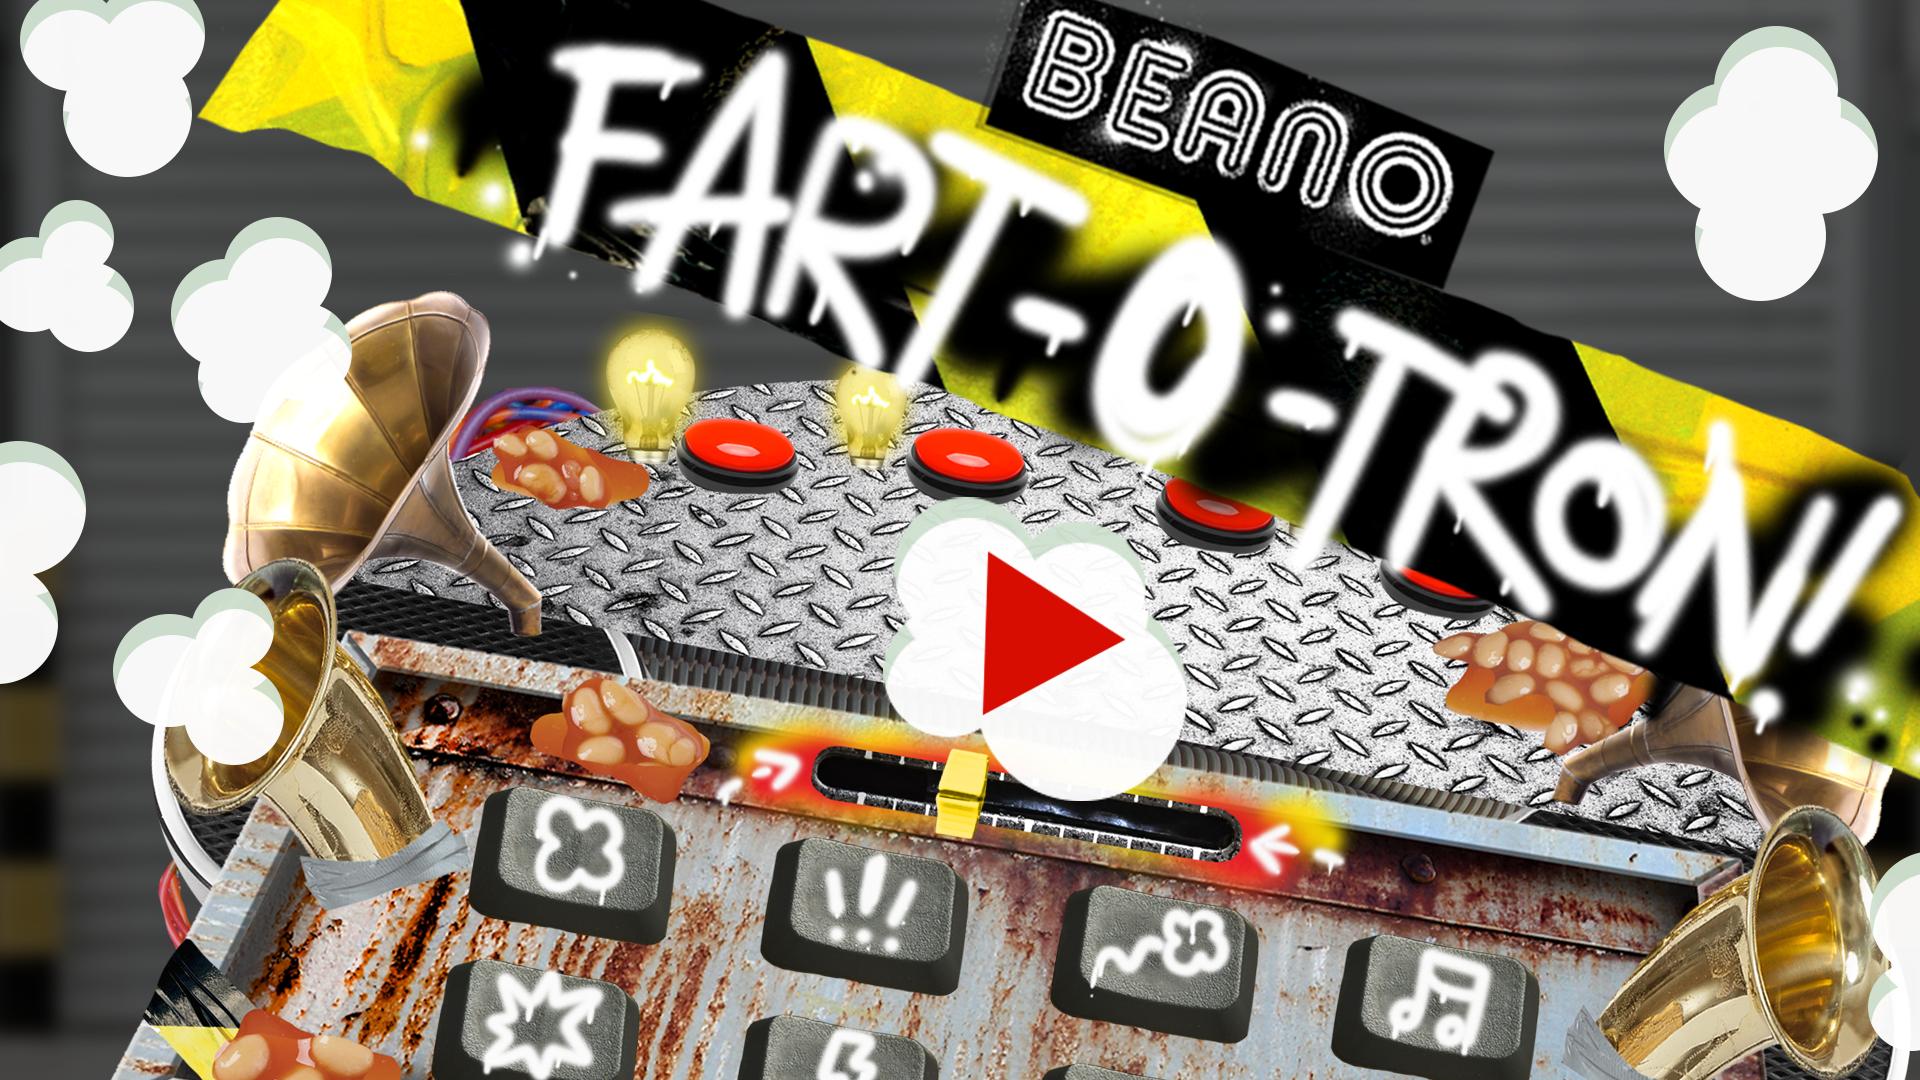 Fart-O-Tron Fart Sounds Button